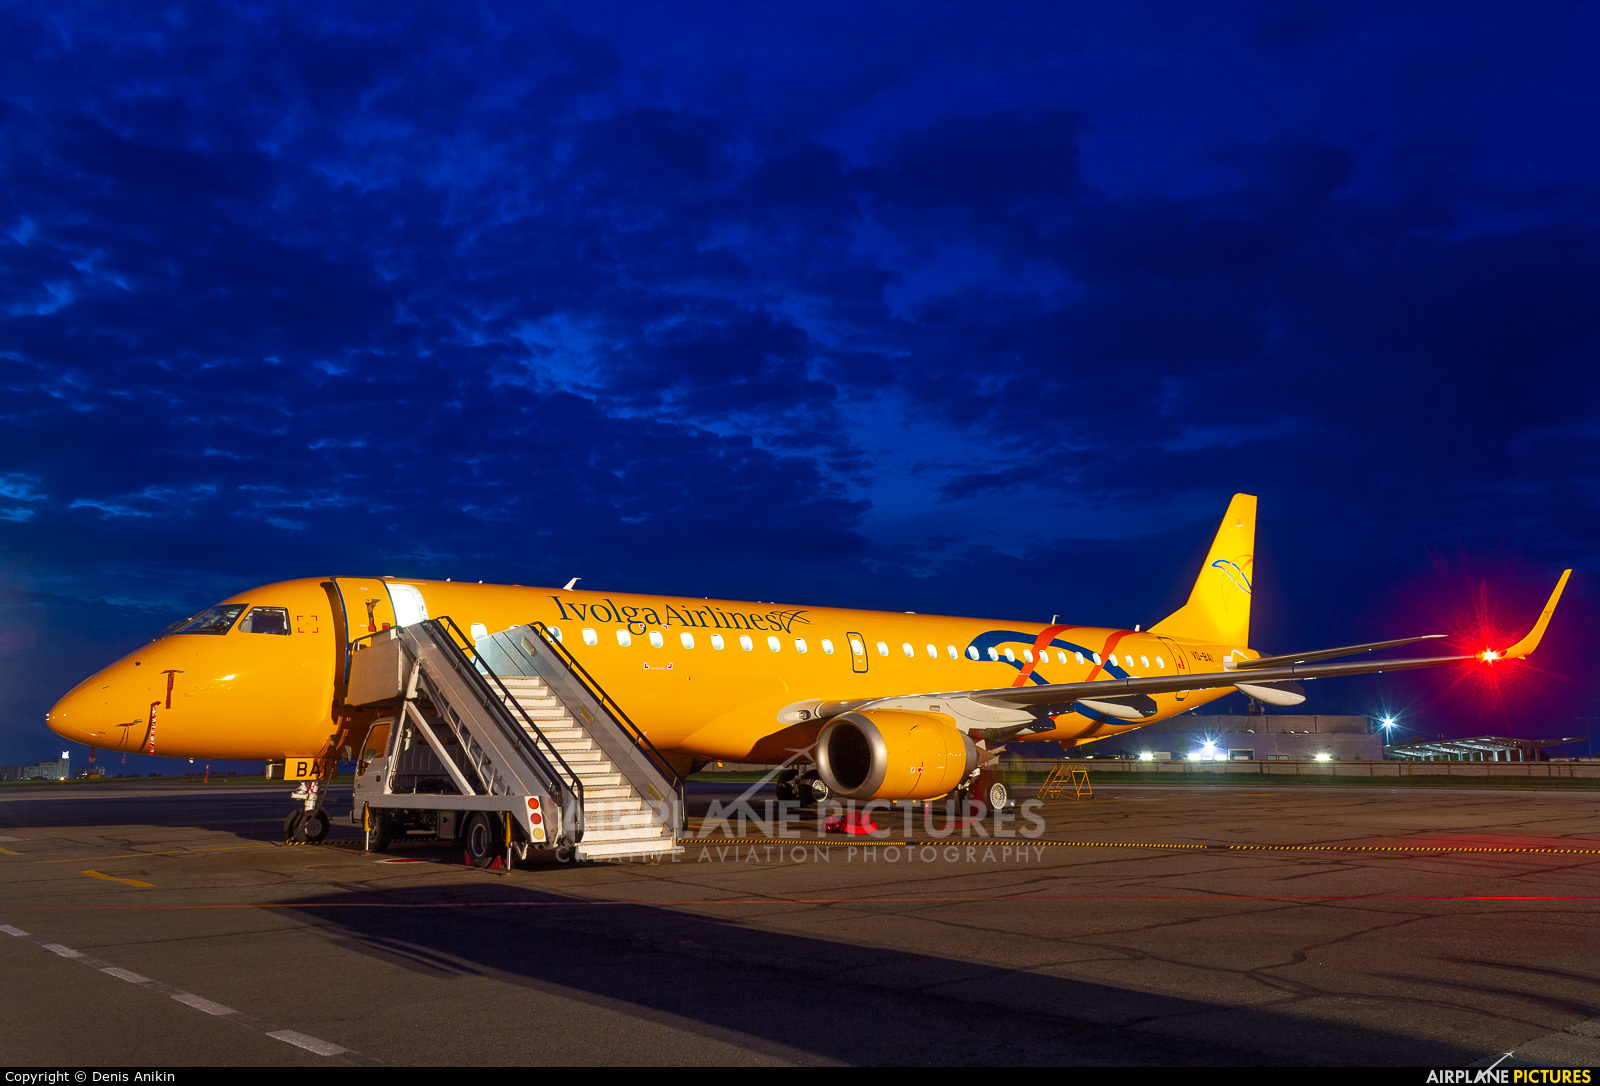 Saratov Airlines VQ-BAI aircraft at Saratov Tsentralny